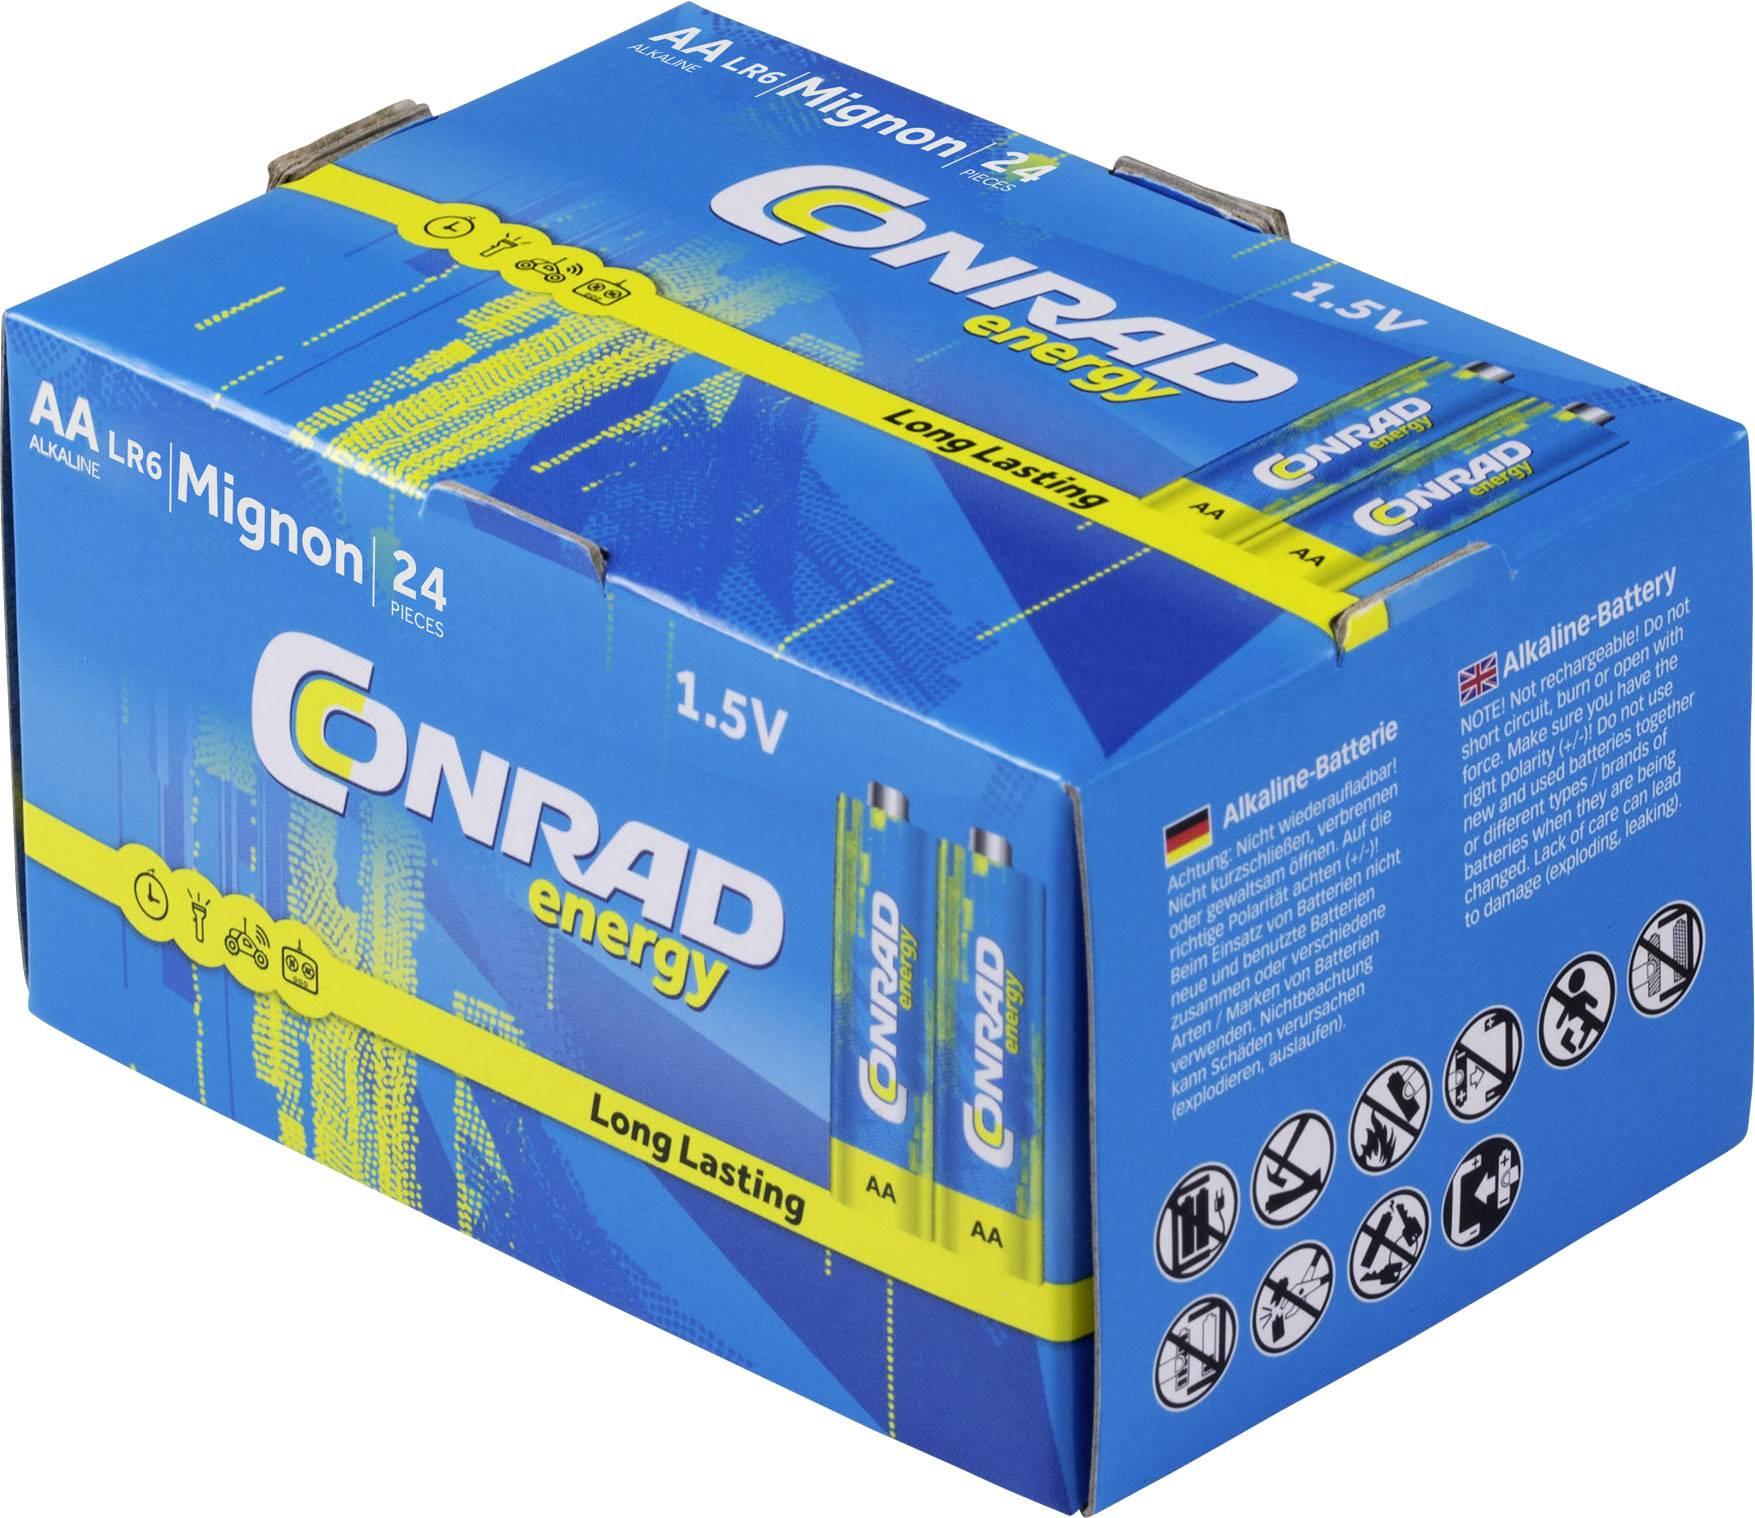 Conrad energy LR06 mignon (AA) baterija alkalno-manganov  1.5 V 24 St.